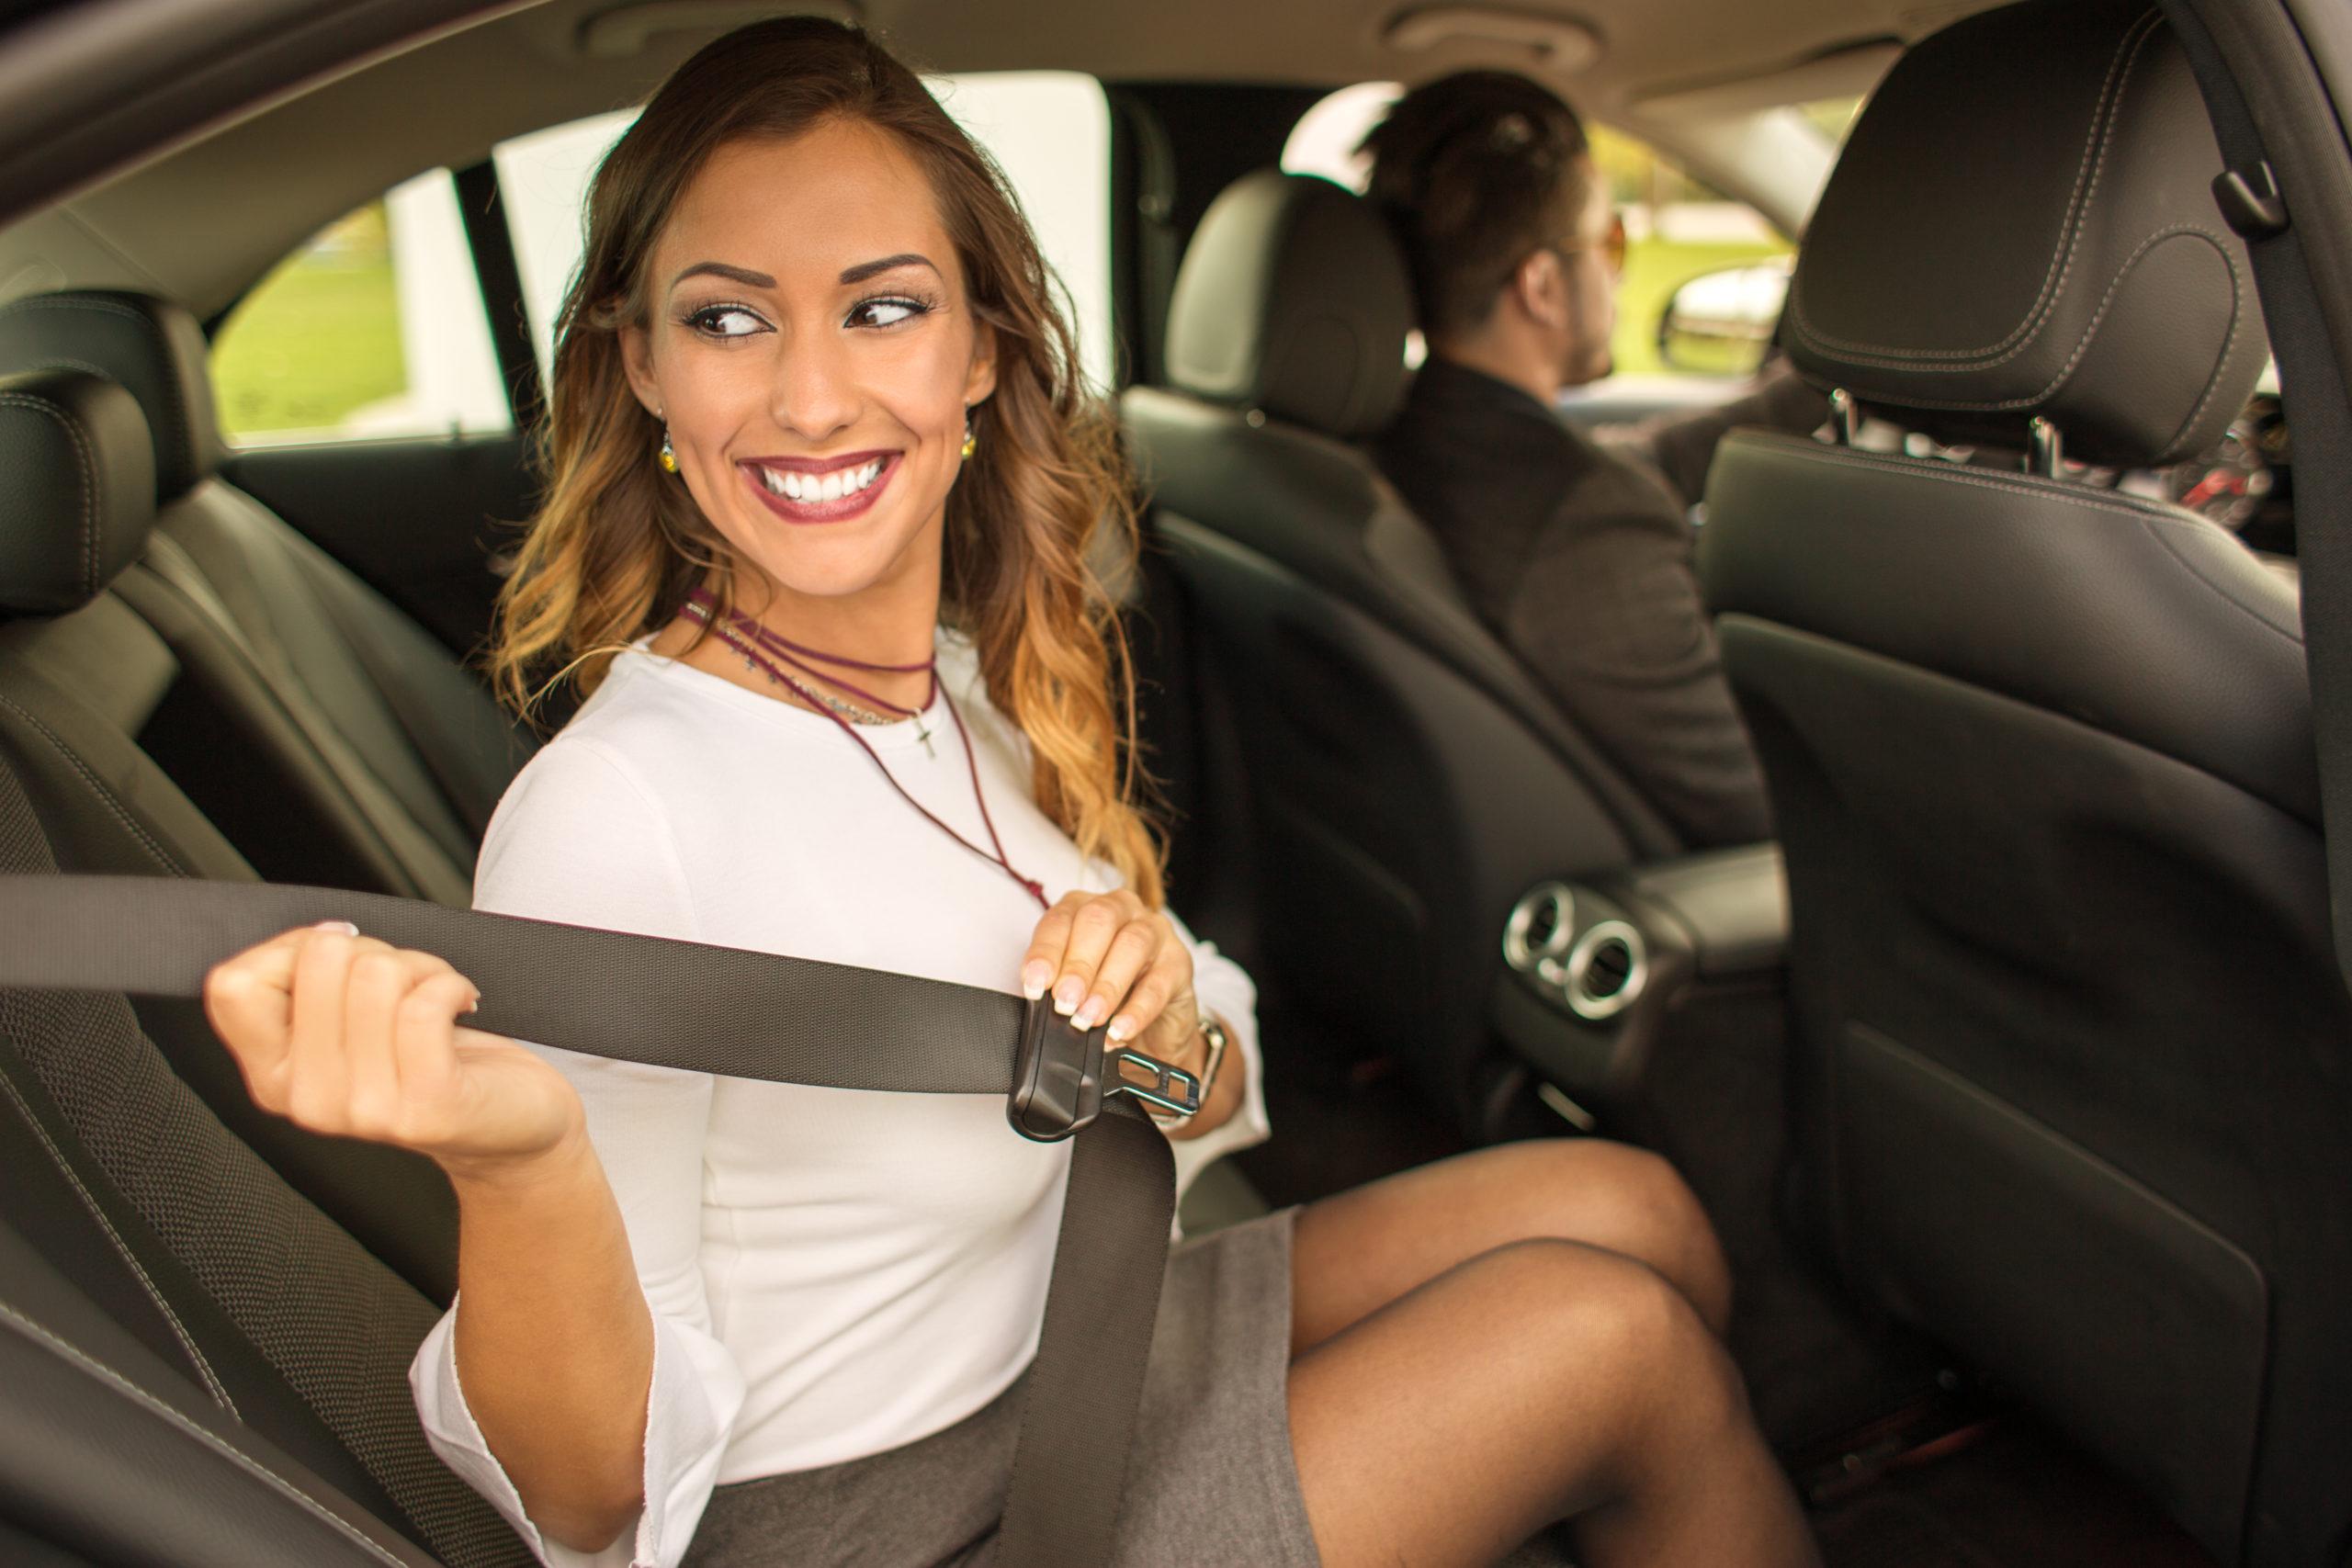 Beautiful businesswoman putting on seatbelt in car